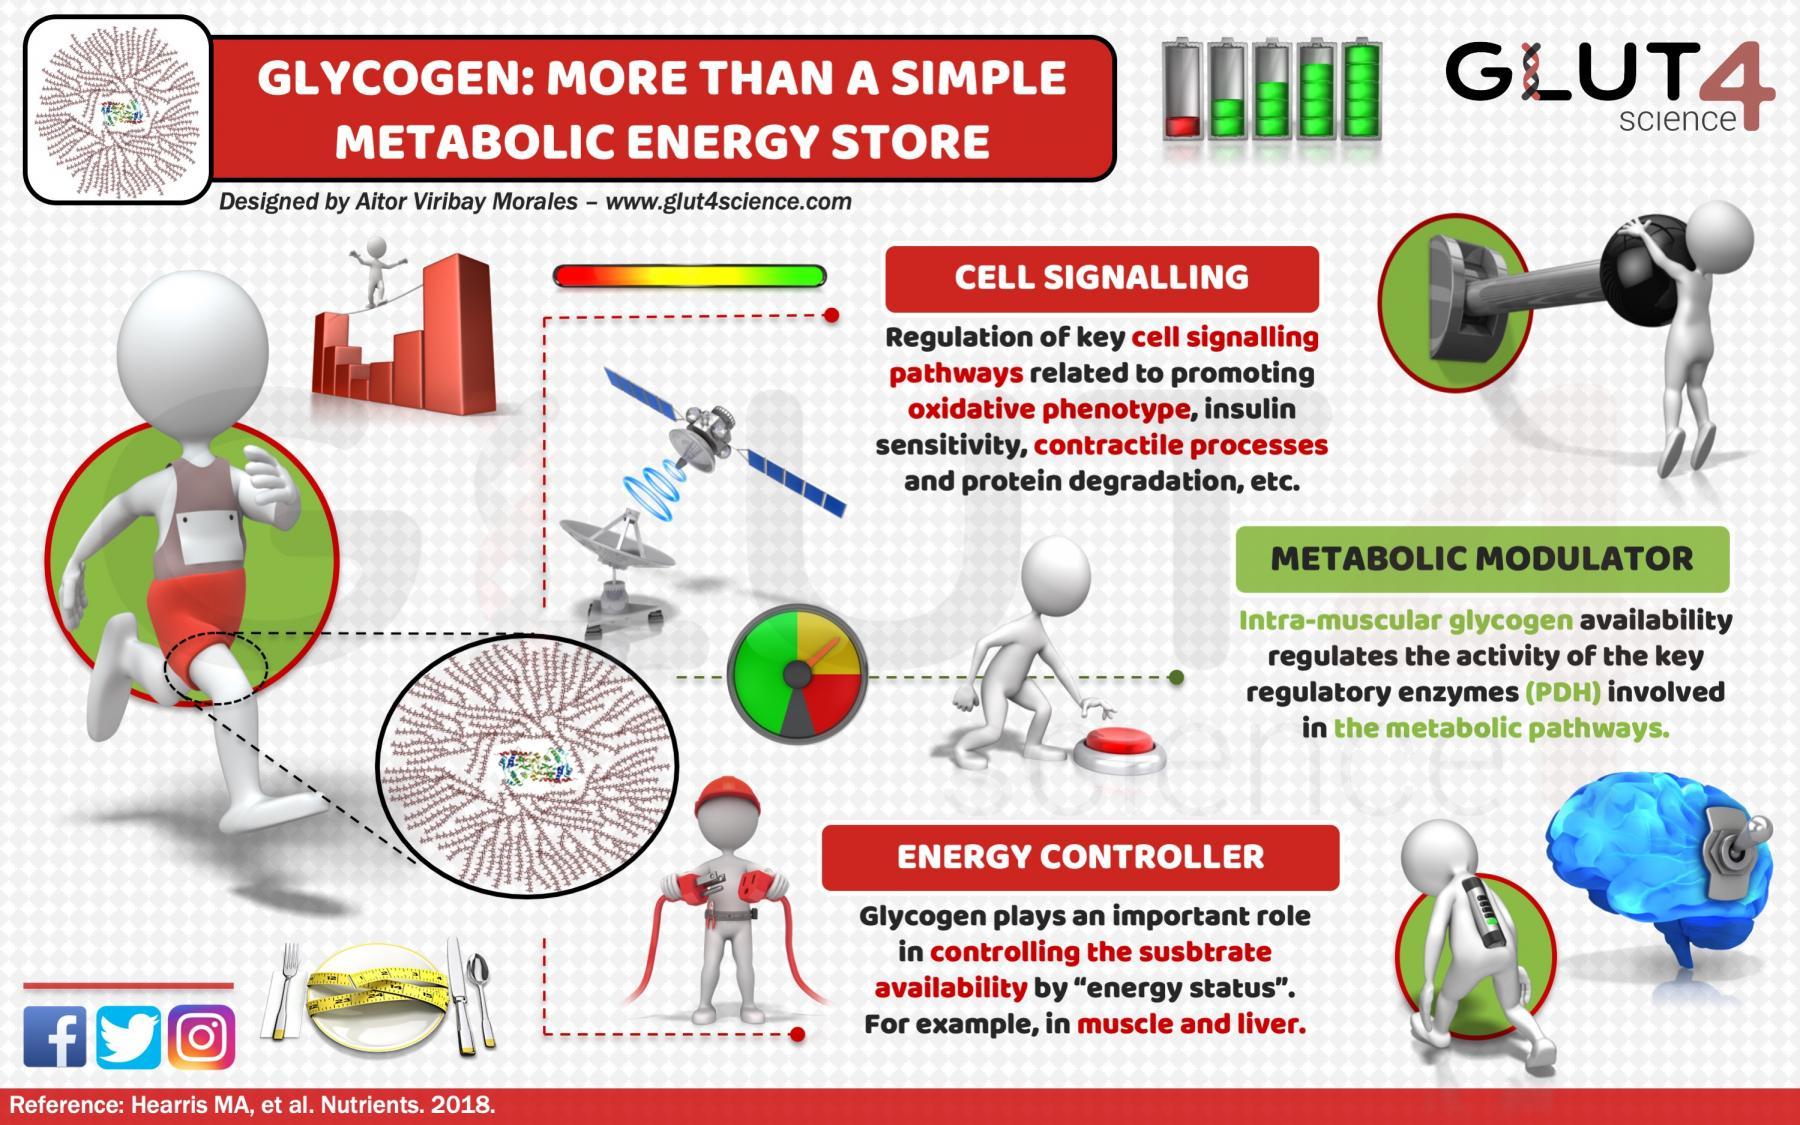 Glygocen: more than energy store?